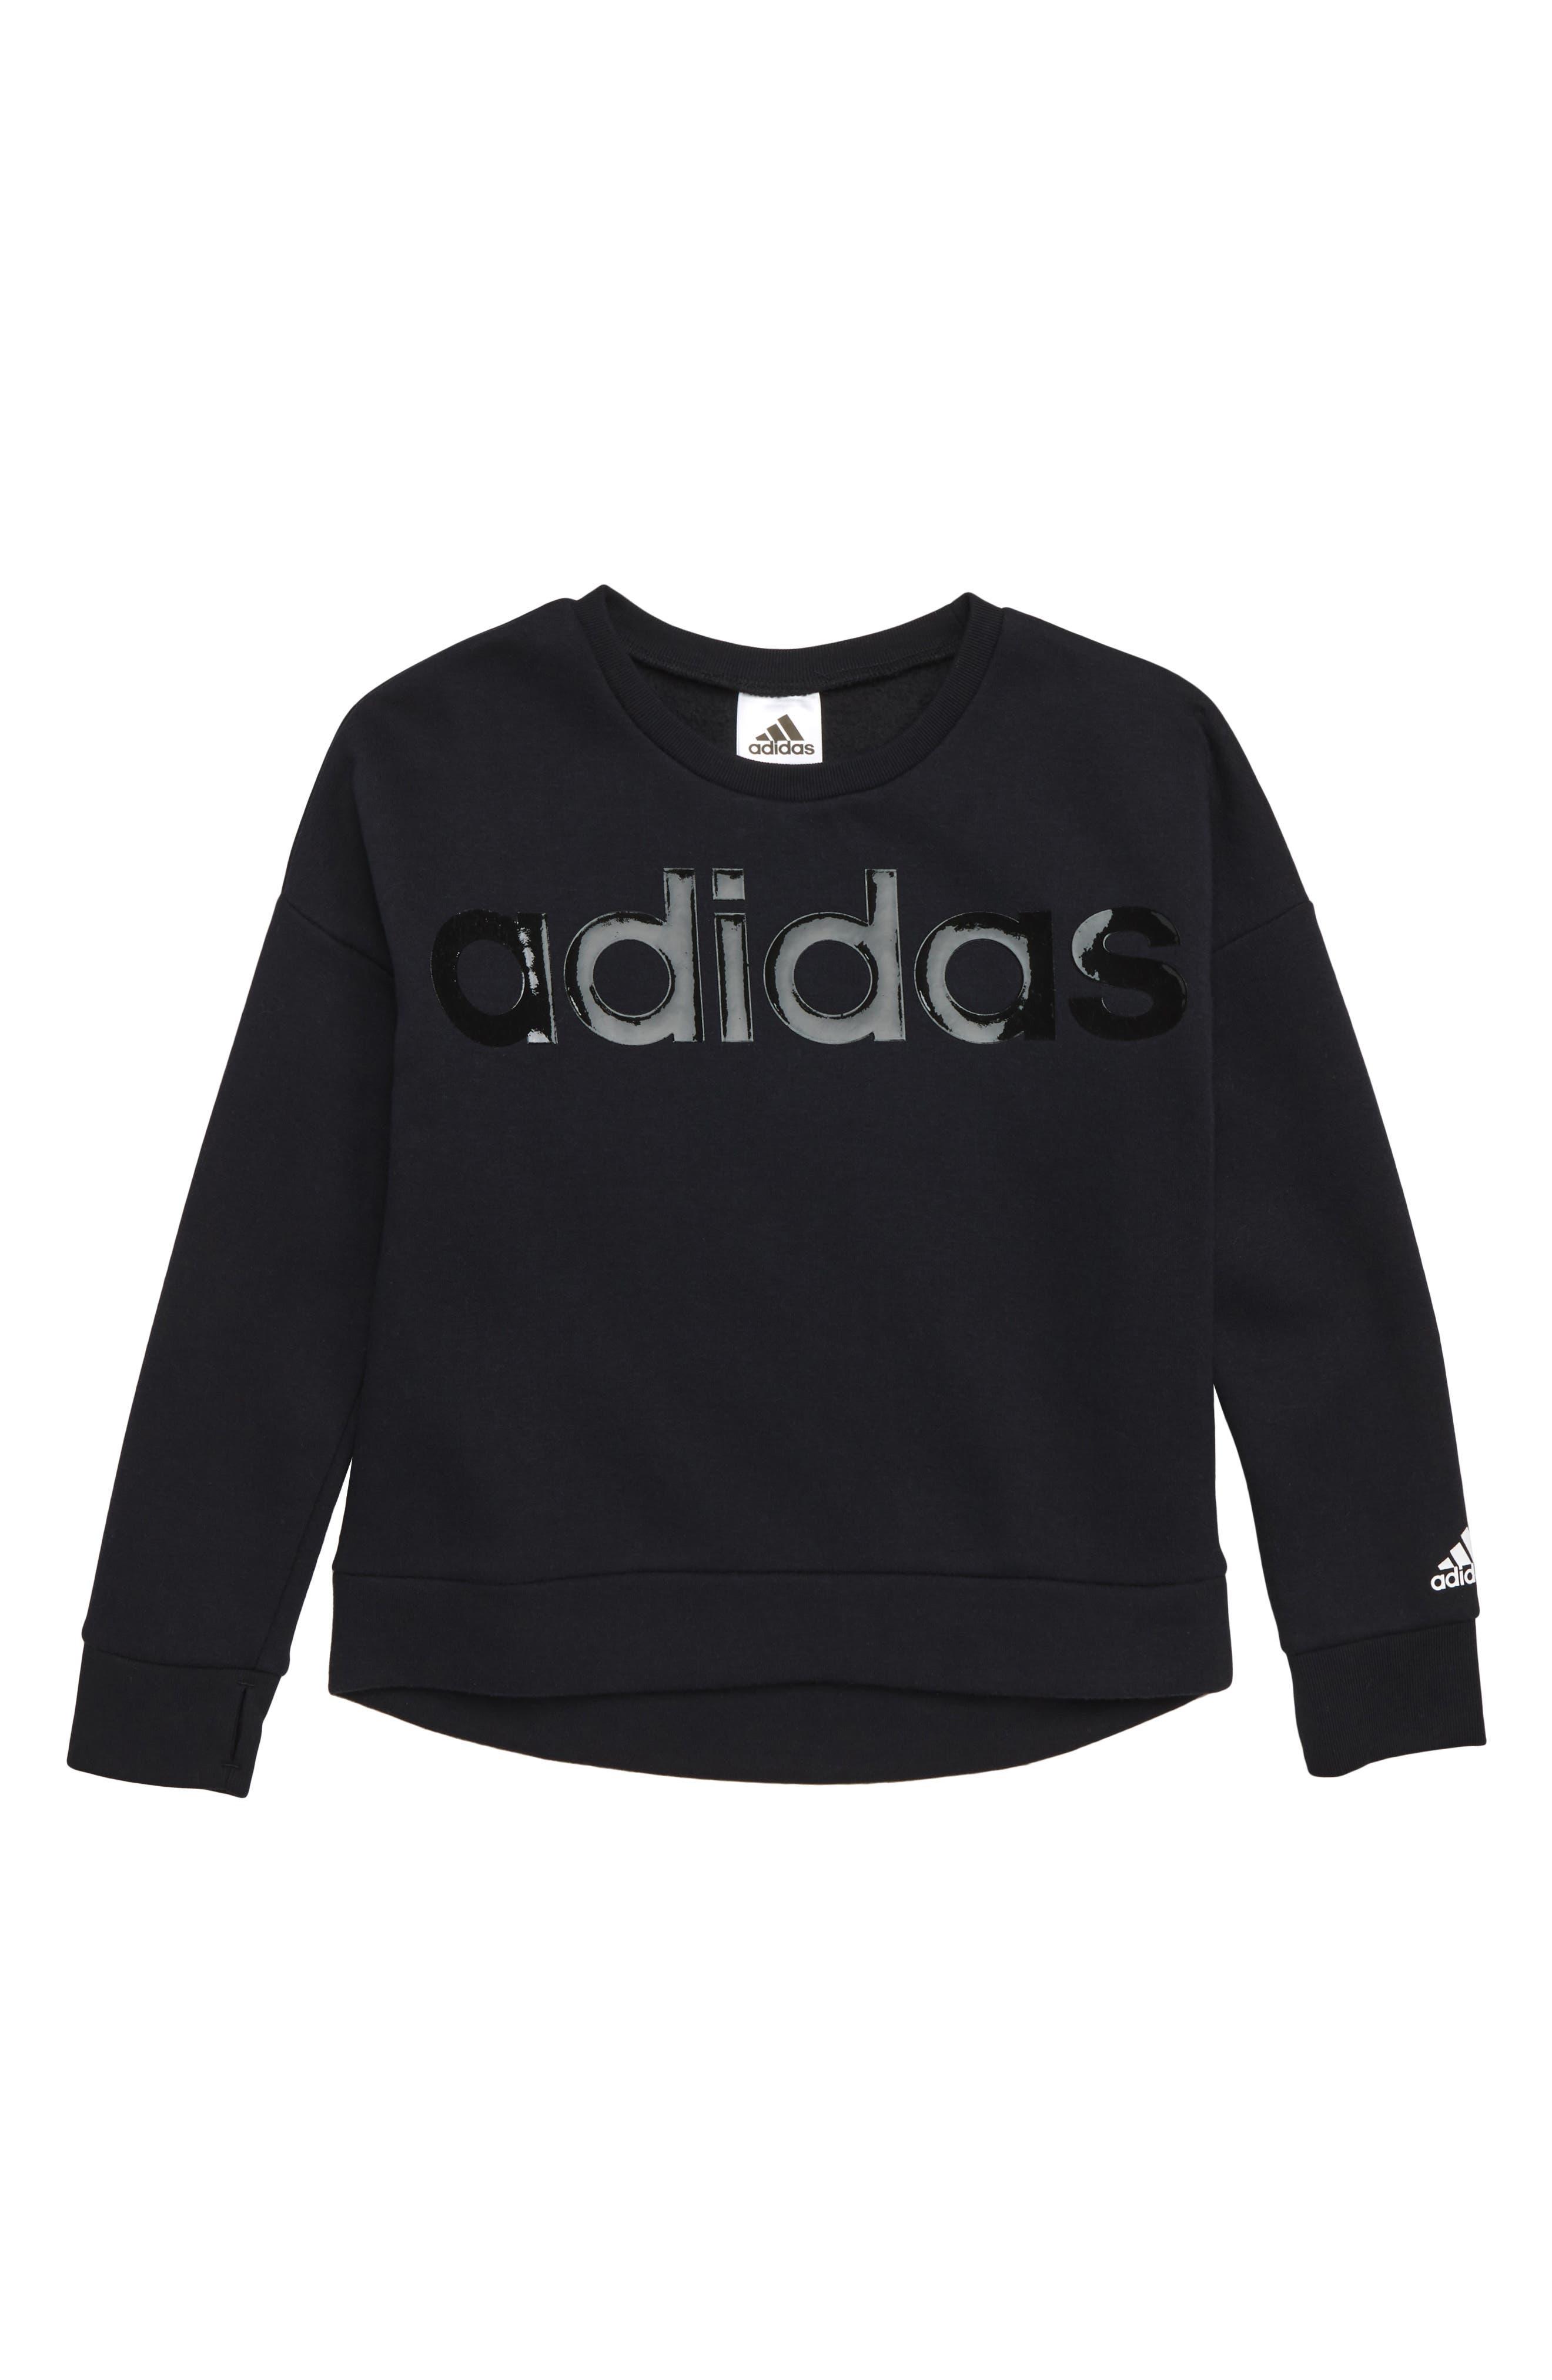 Cropped Sweatshirt,                             Main thumbnail 1, color,                             BLACK